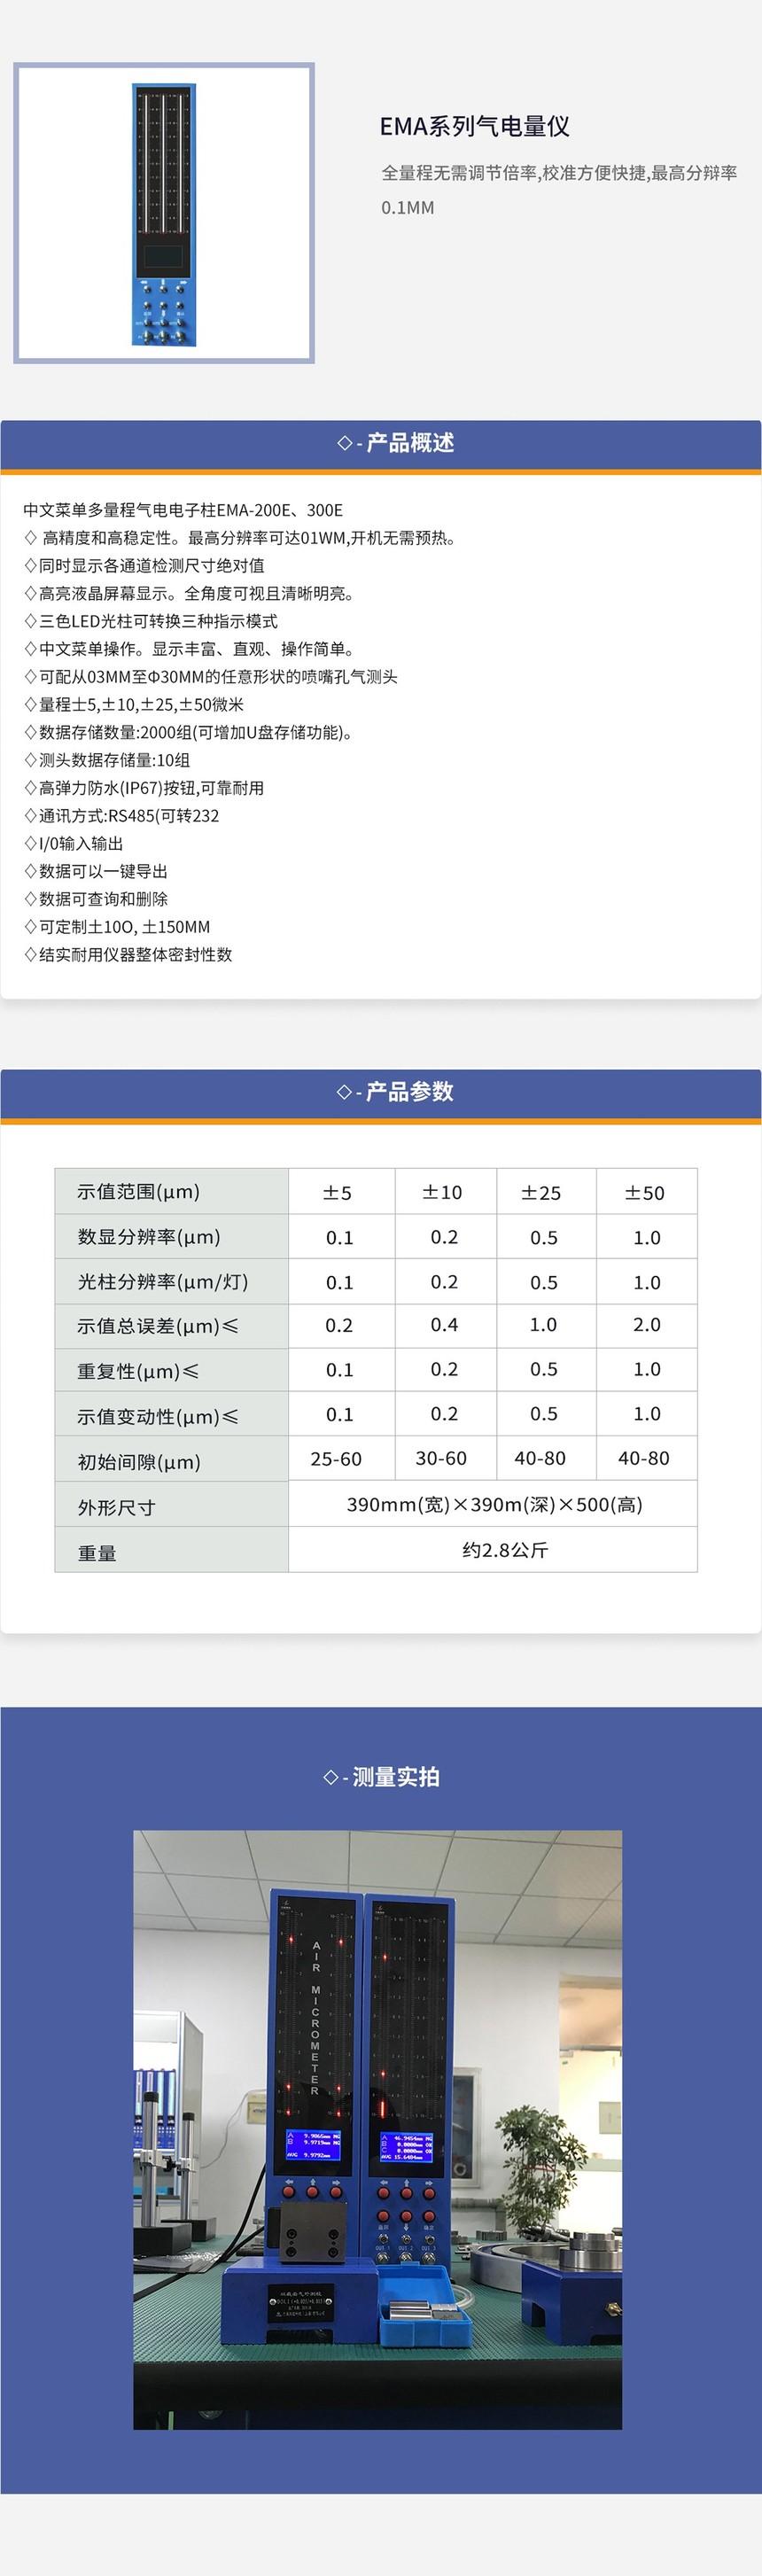 EMA系列气电量仪_02.jpg